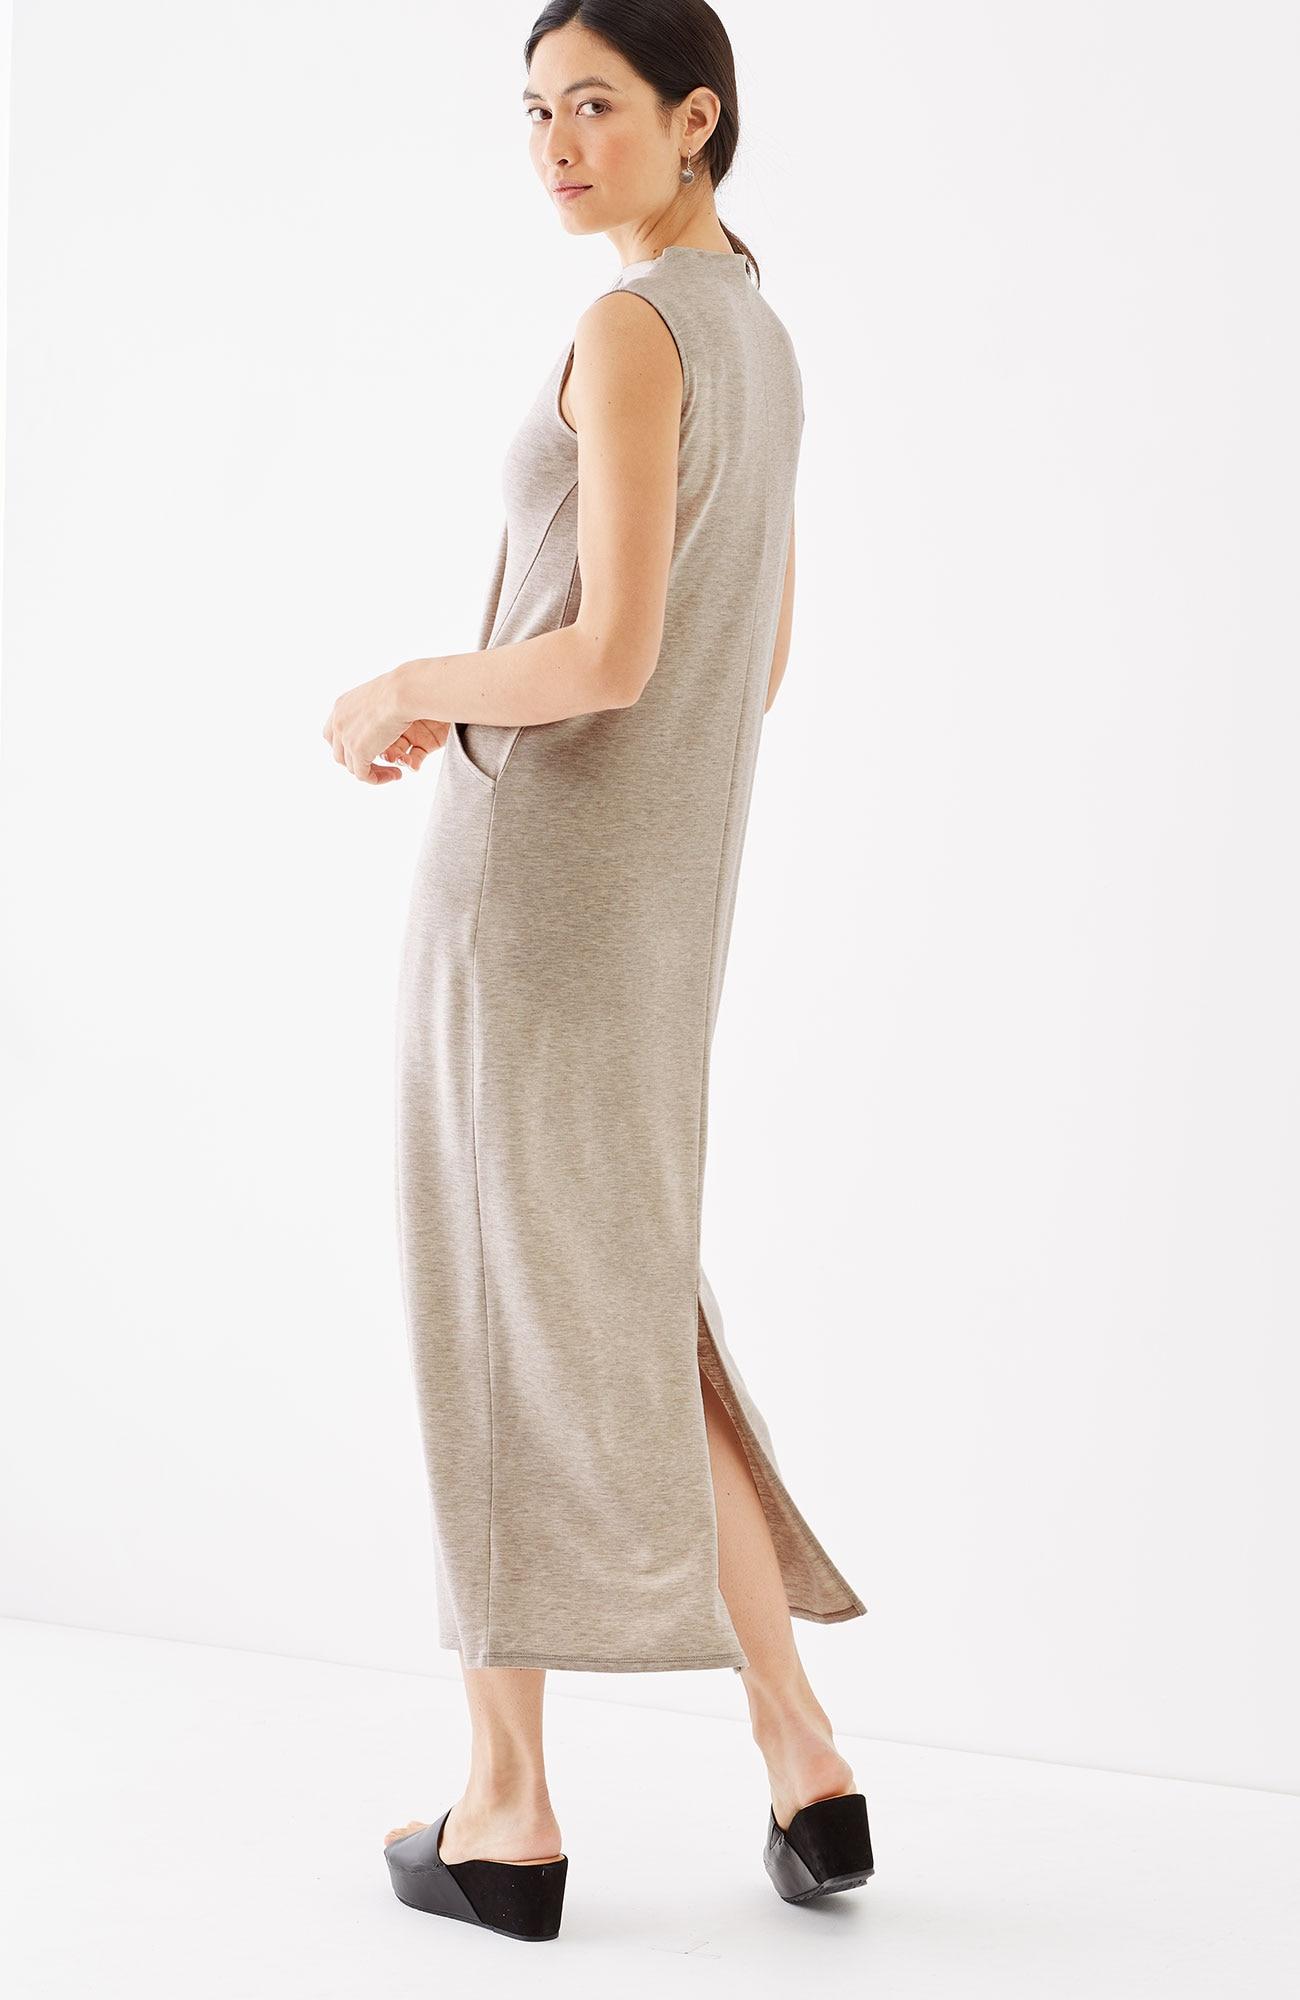 Pure Jill Luxe Tencel® mock-neck maxi dress